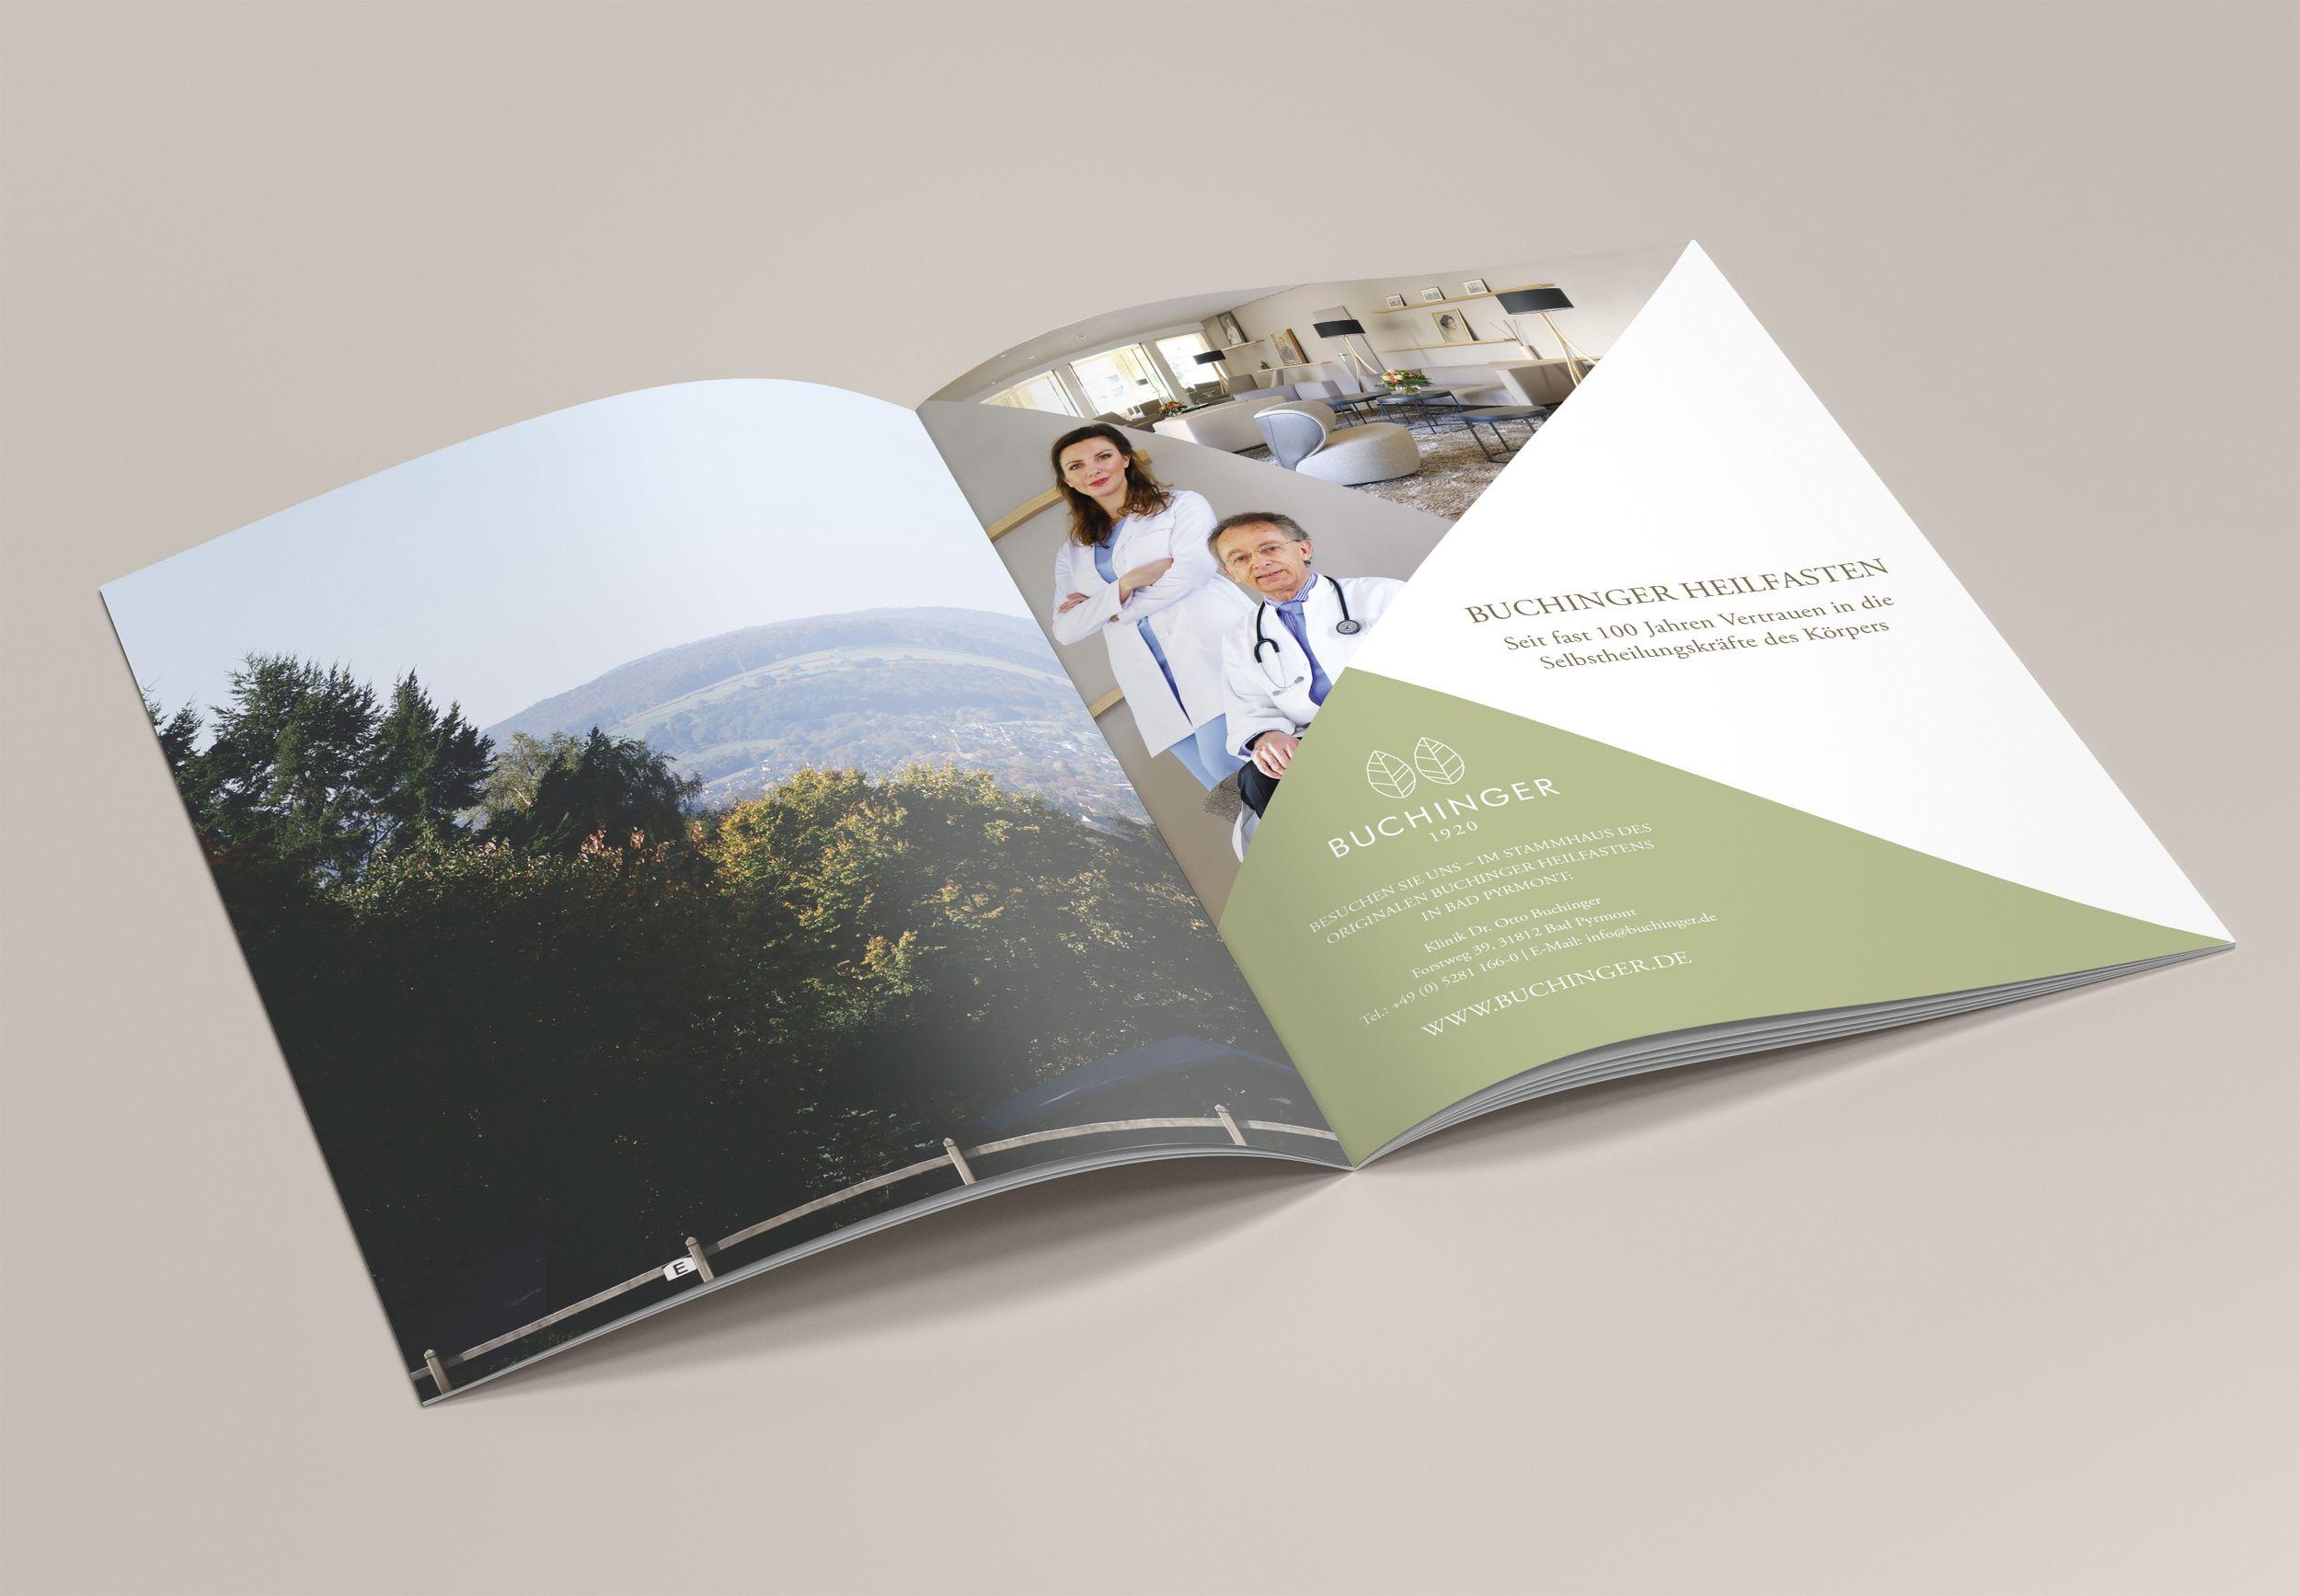 bk_booklet_web